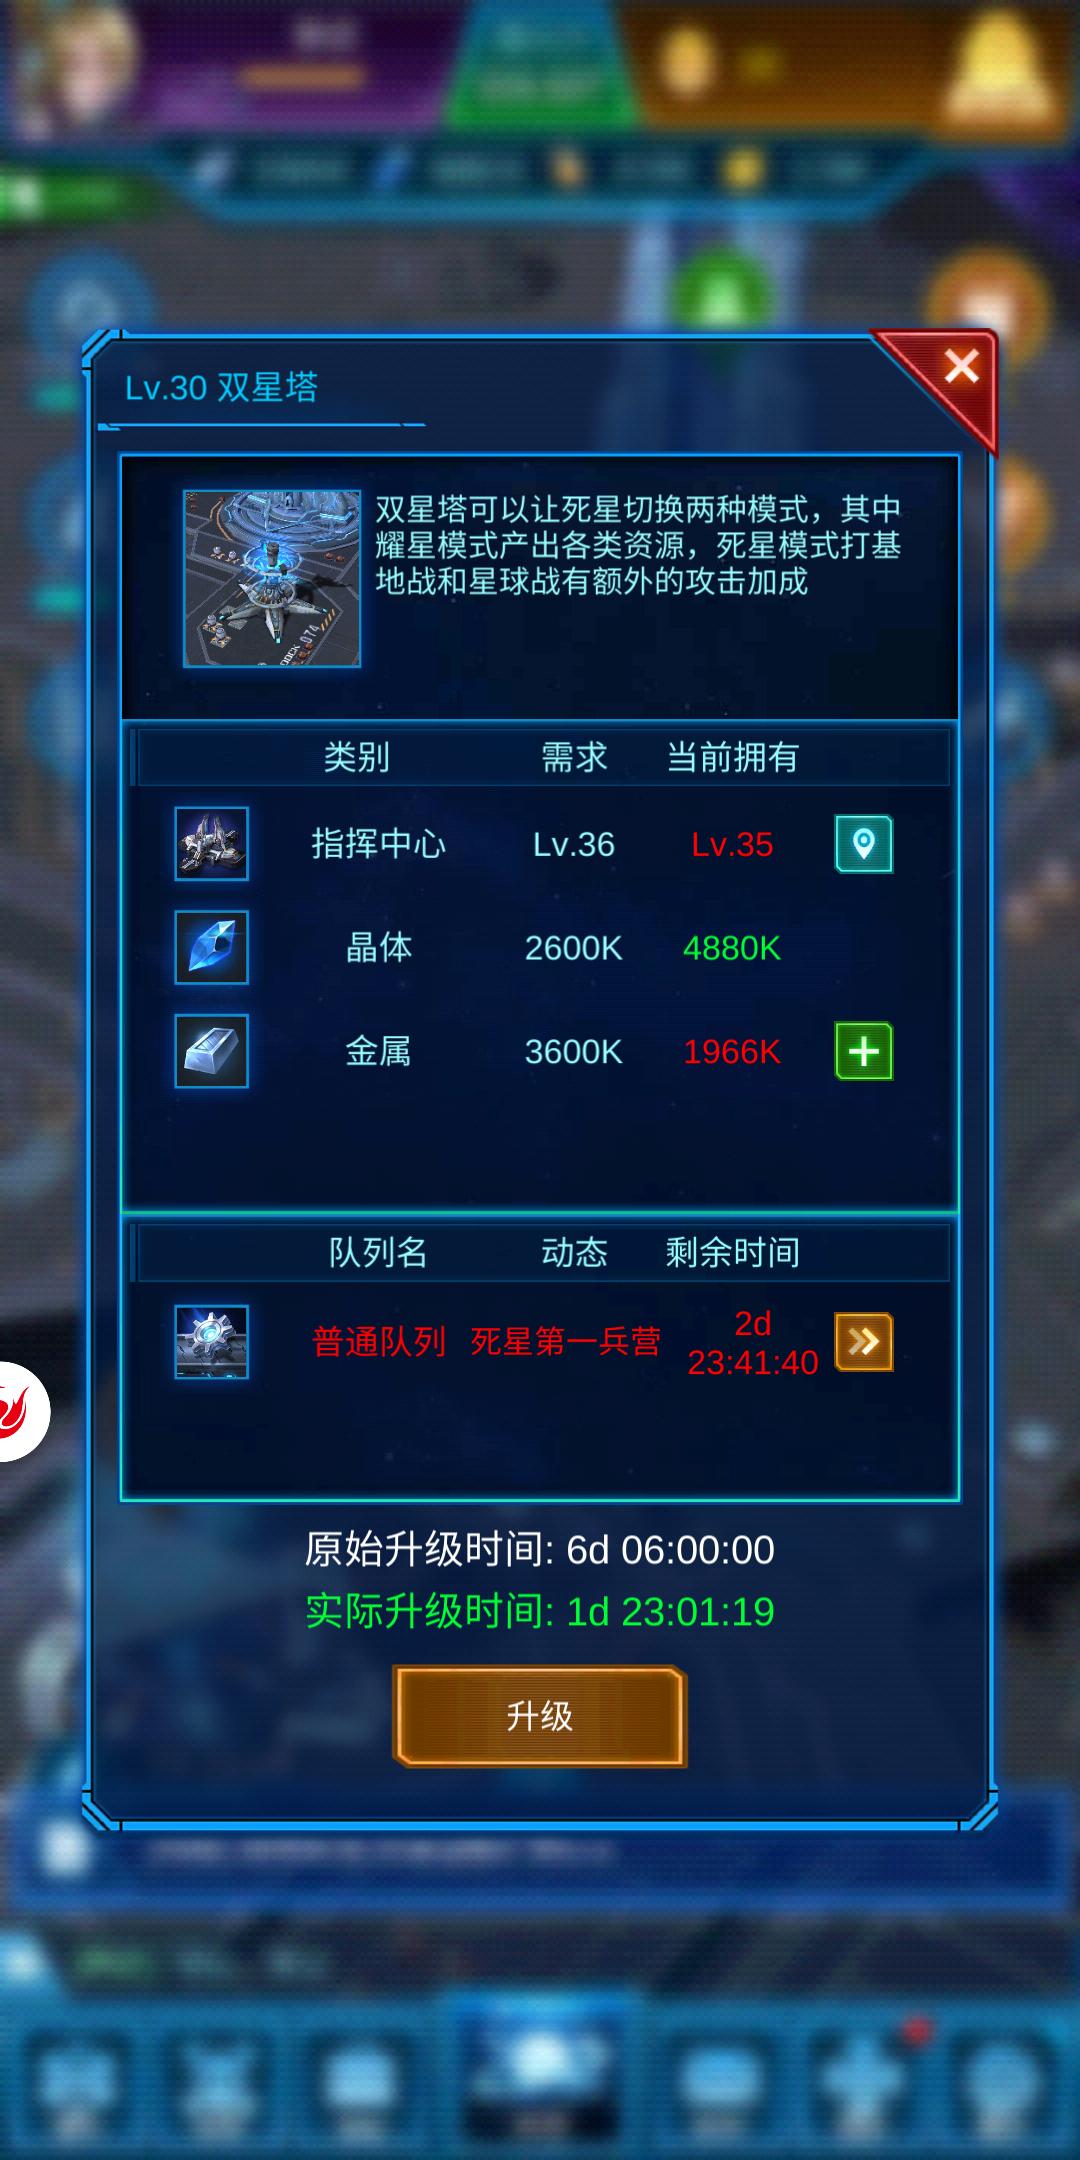 Screenshot_2020-03-20-12-02-36-041_com.yhzj.jedi.yueqiu.png